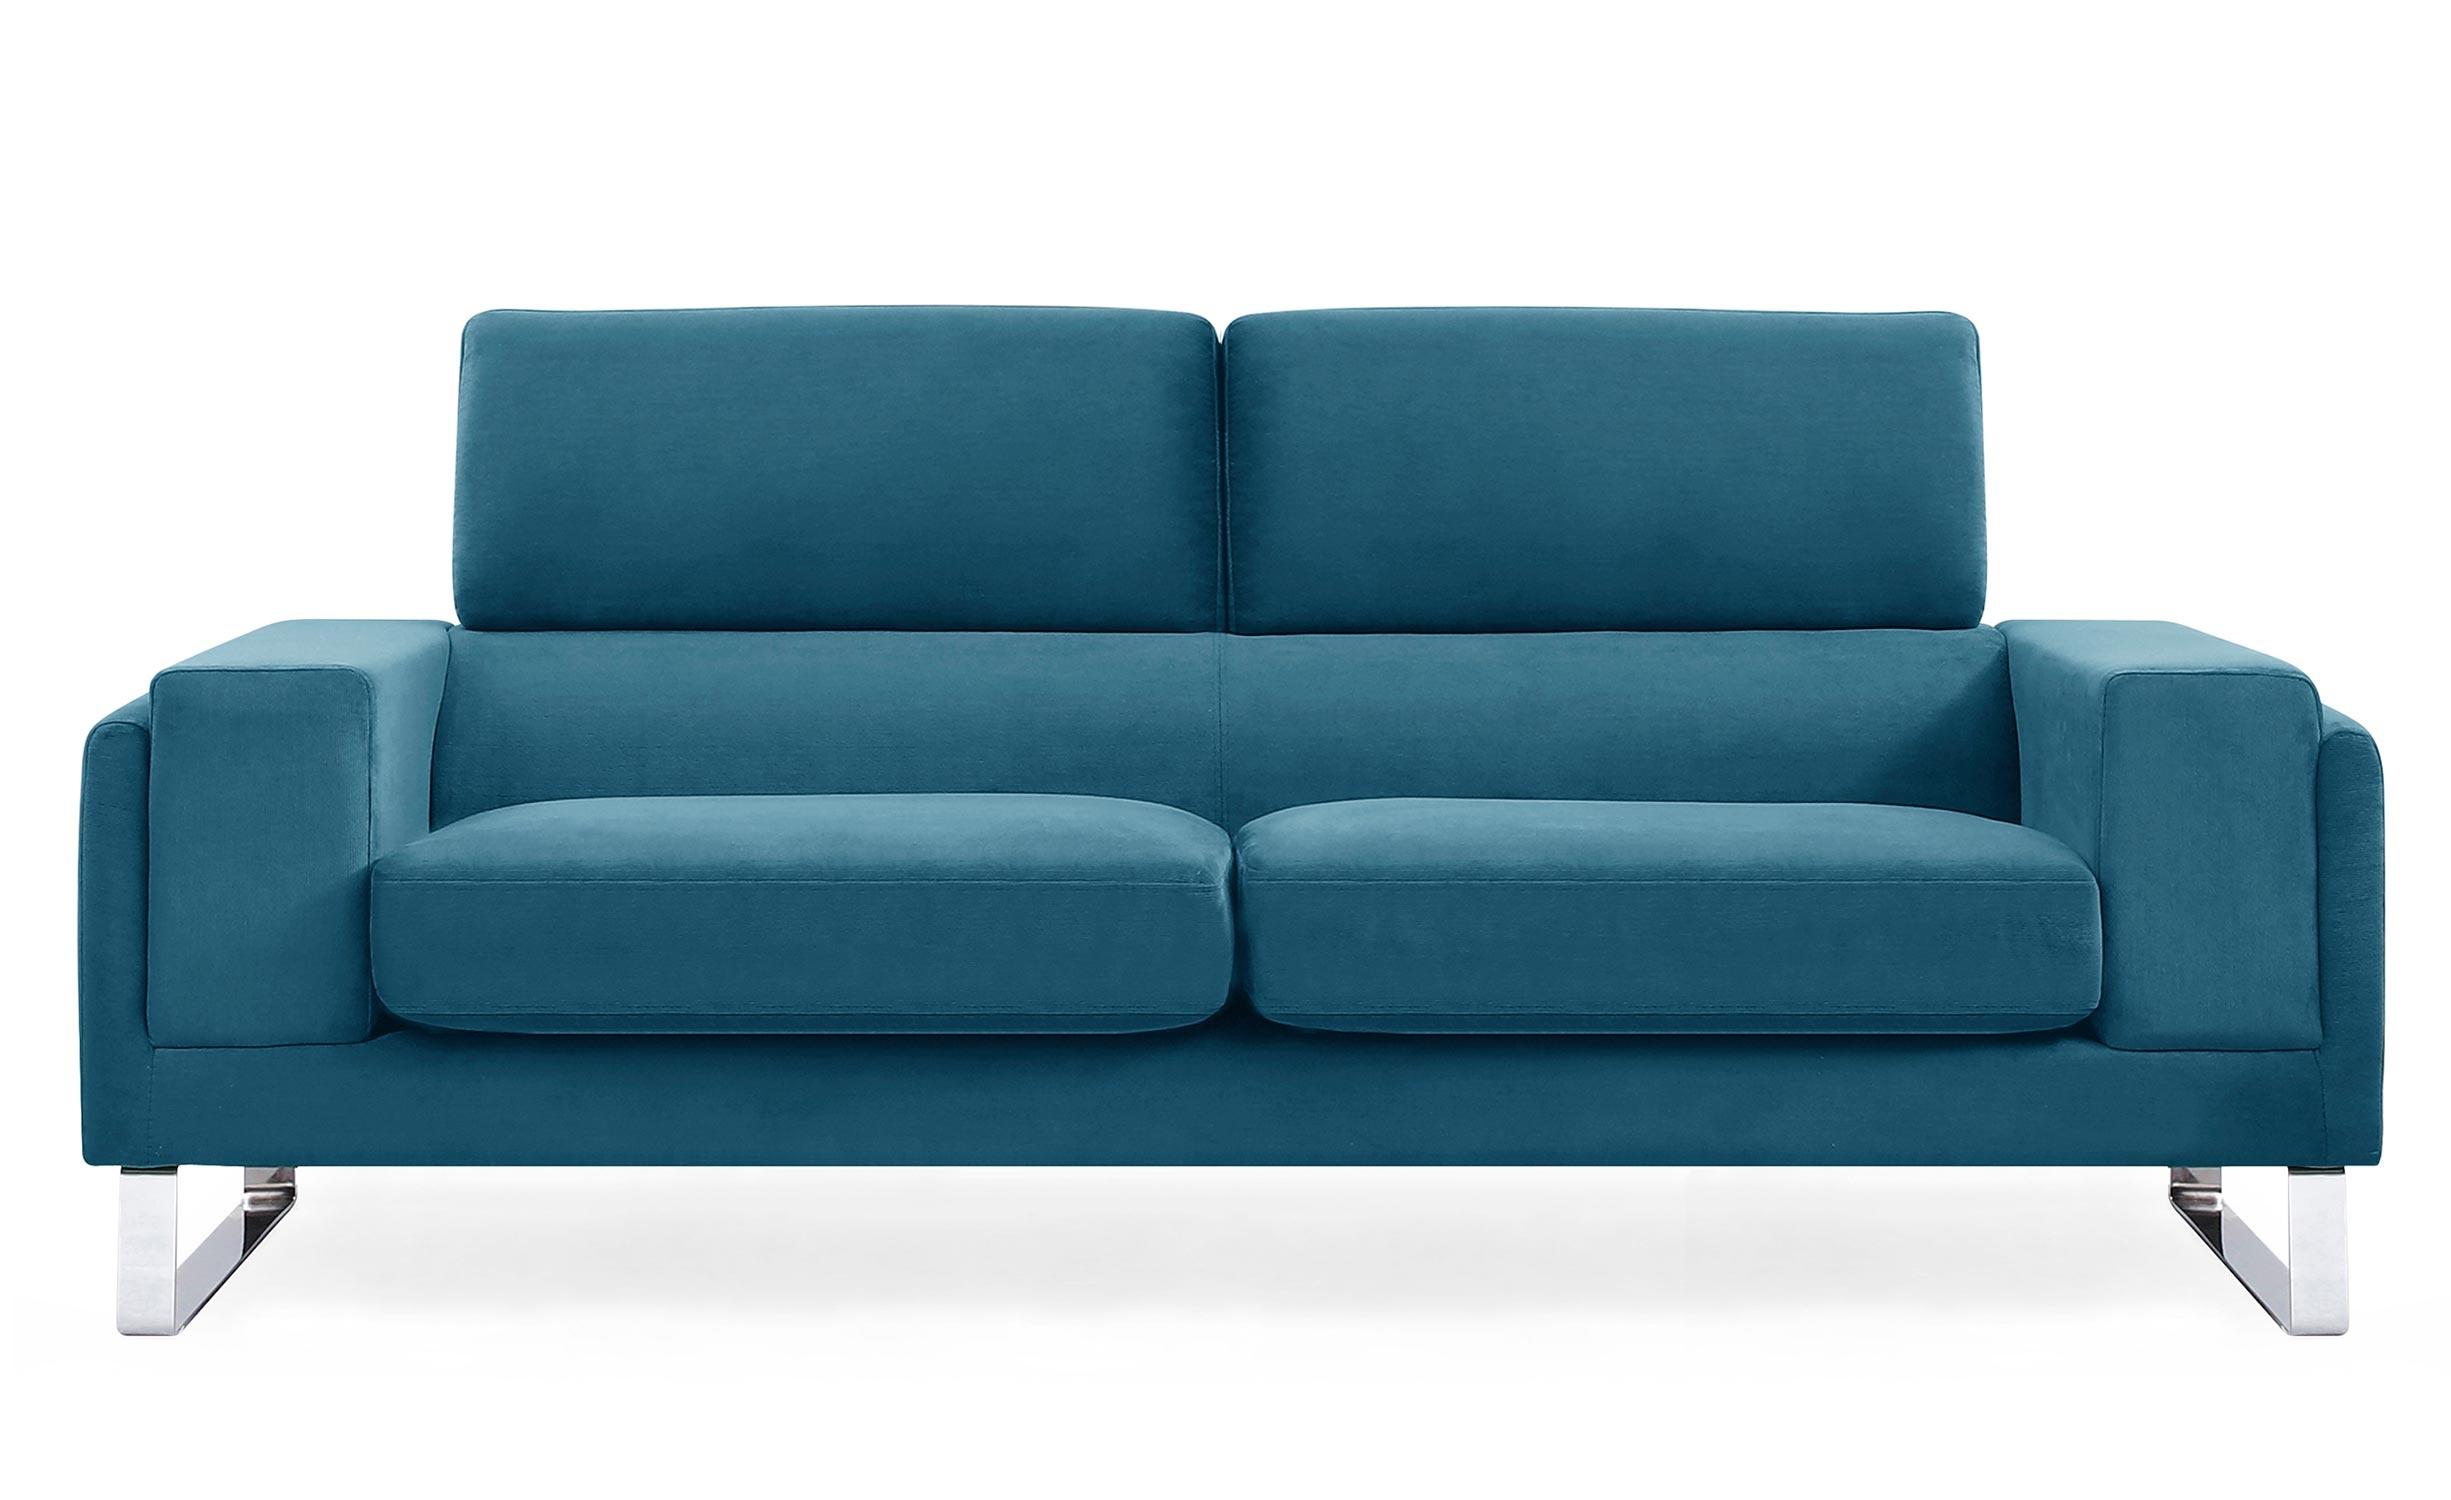 3-zitsbank Barth Corduroy blauw